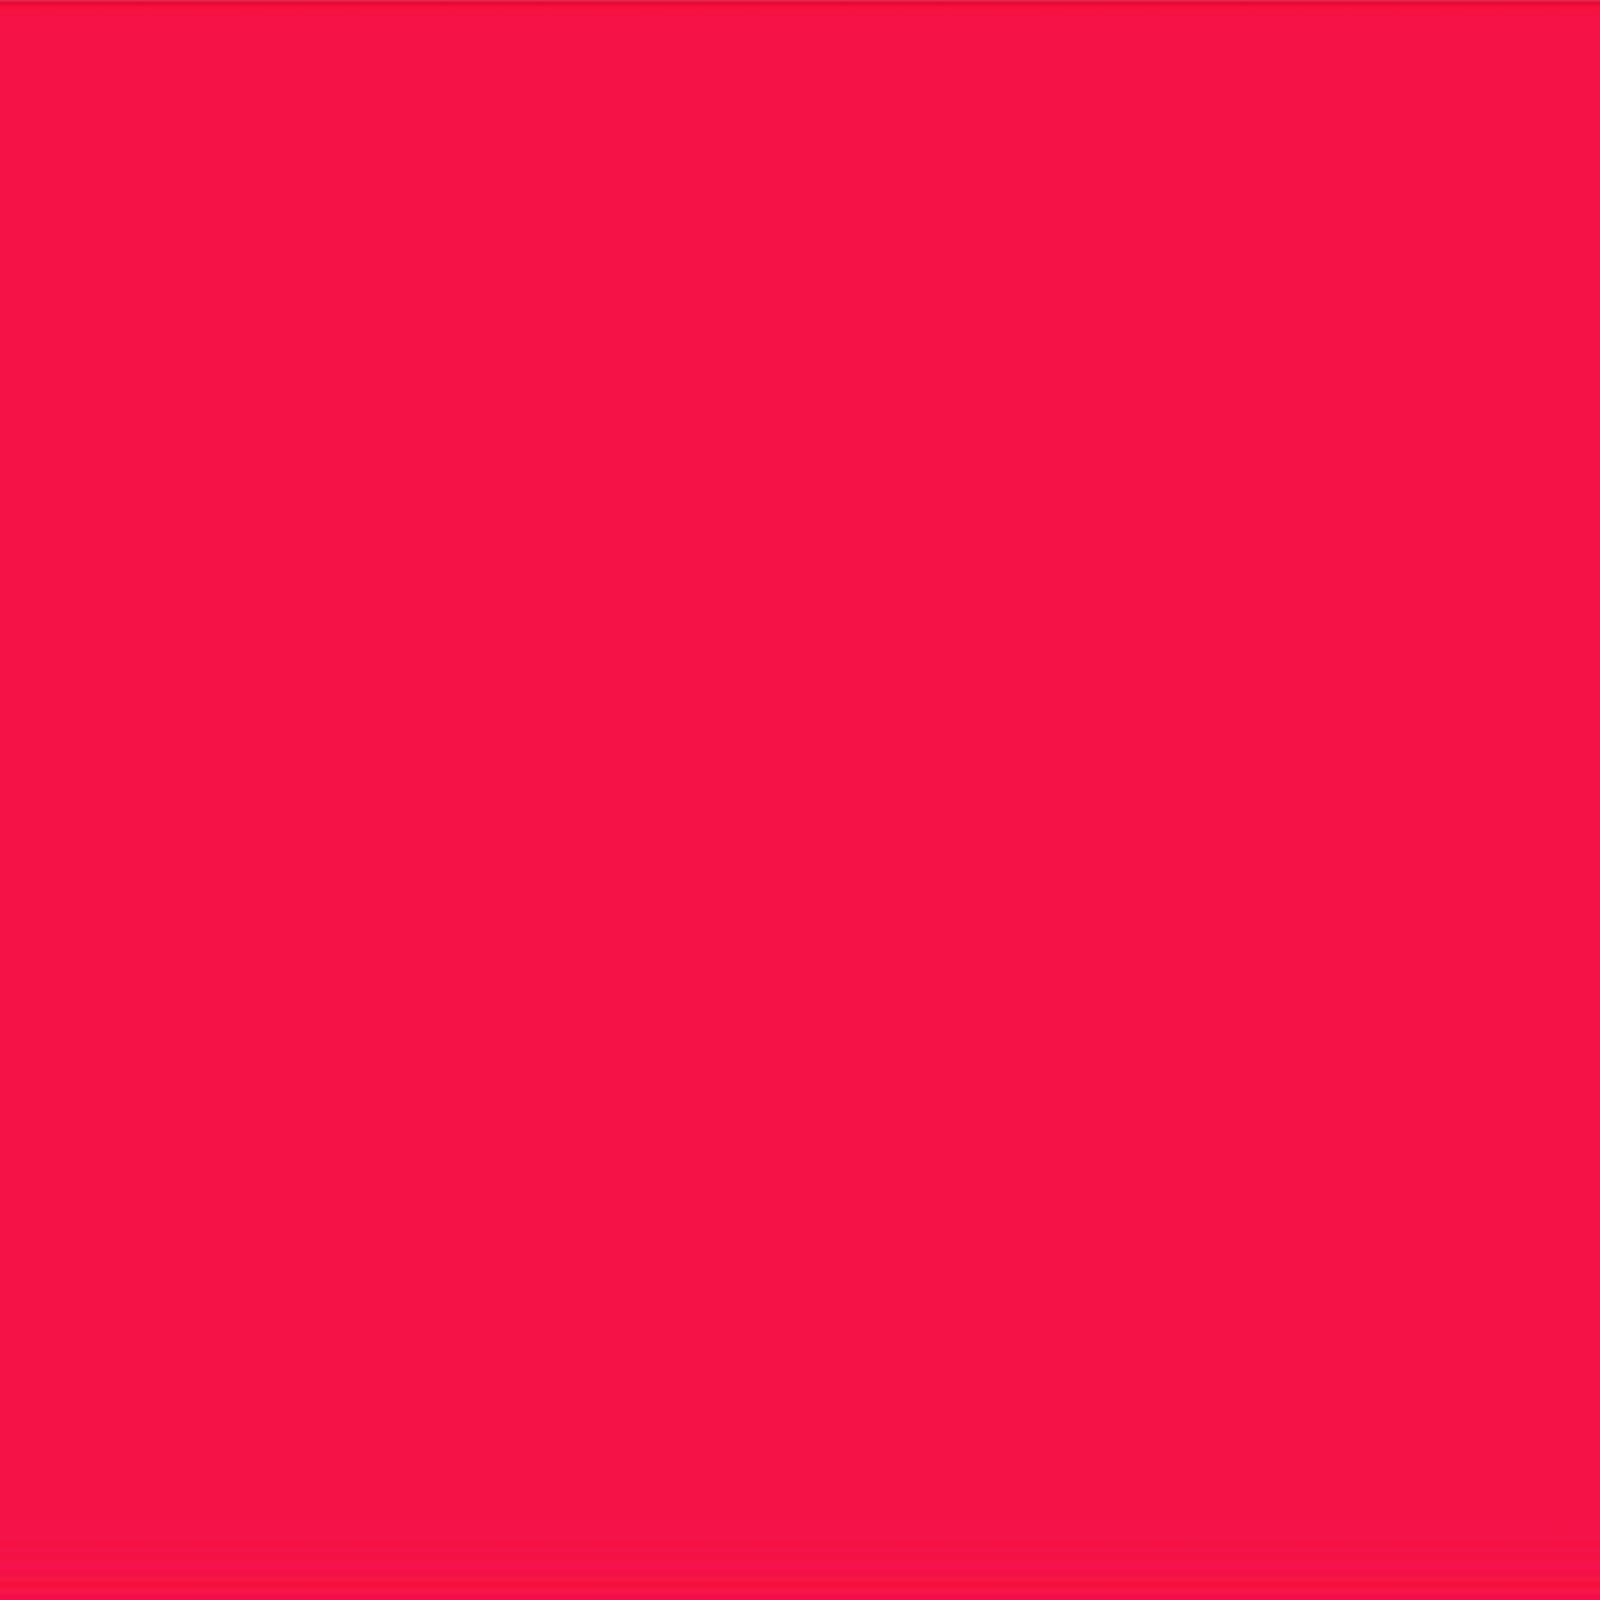 rosu scarlet